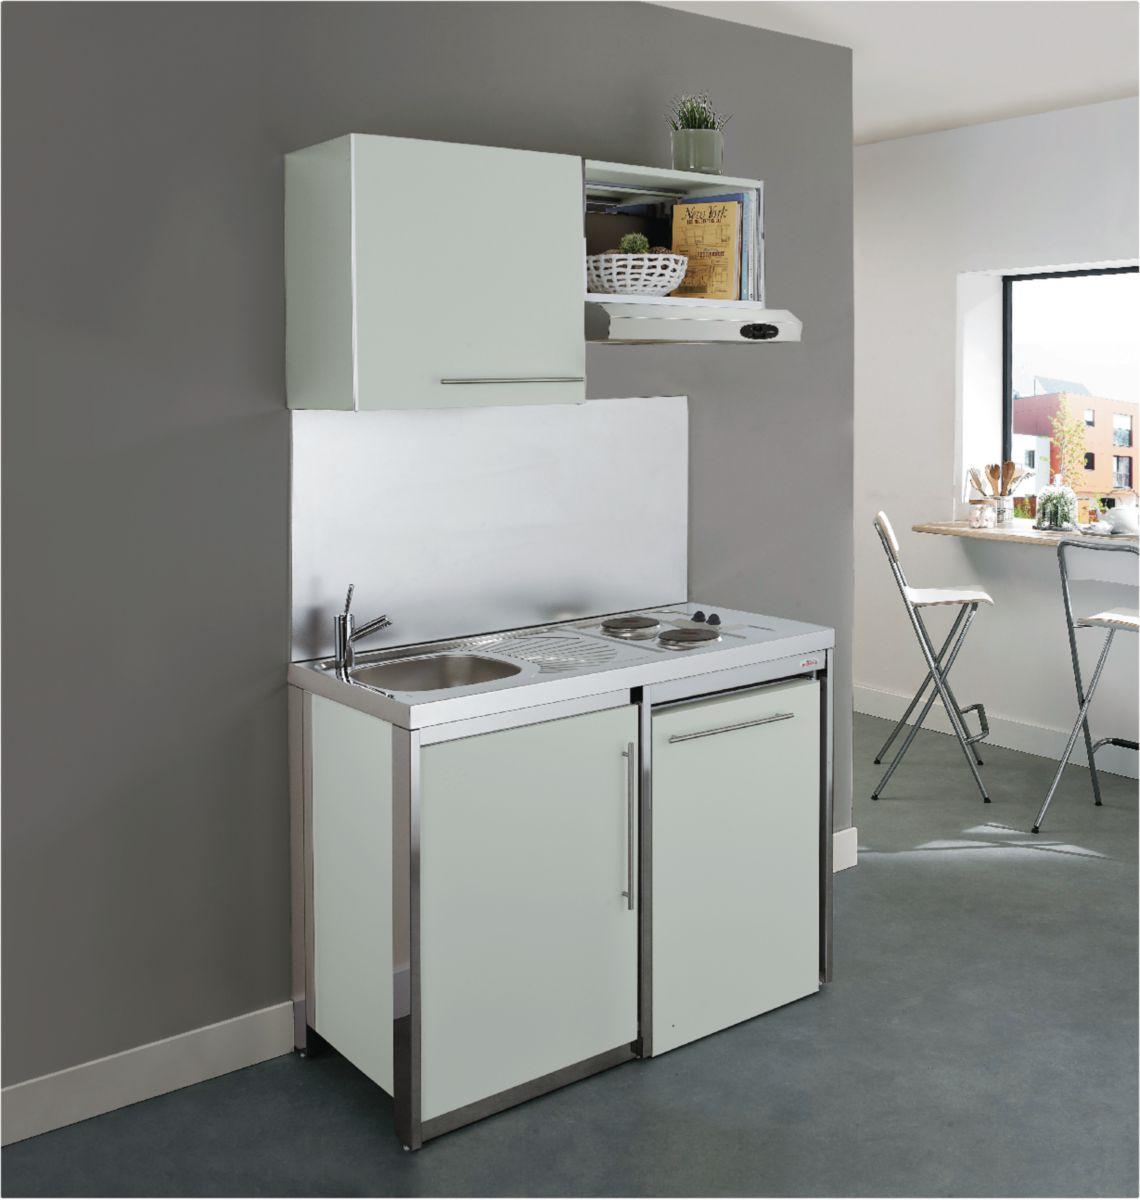 Moderna cuisinette metalline en 120 cm coloris gris soie r f kpaz120t22 cedeo - Cuisinette moderna ...